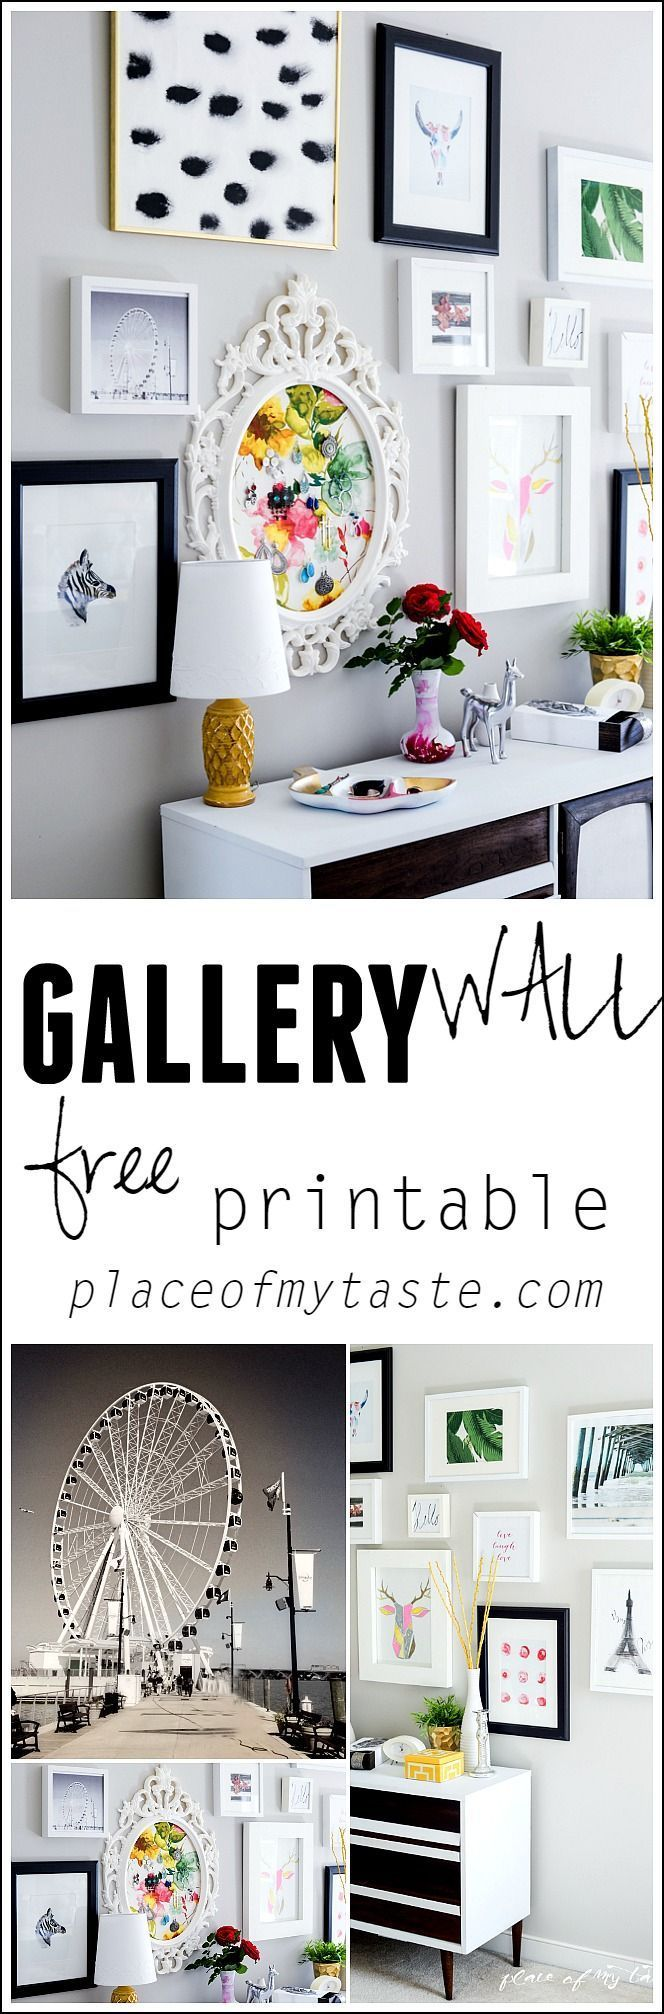 #gallery #gallery #place #taste #wall #wall